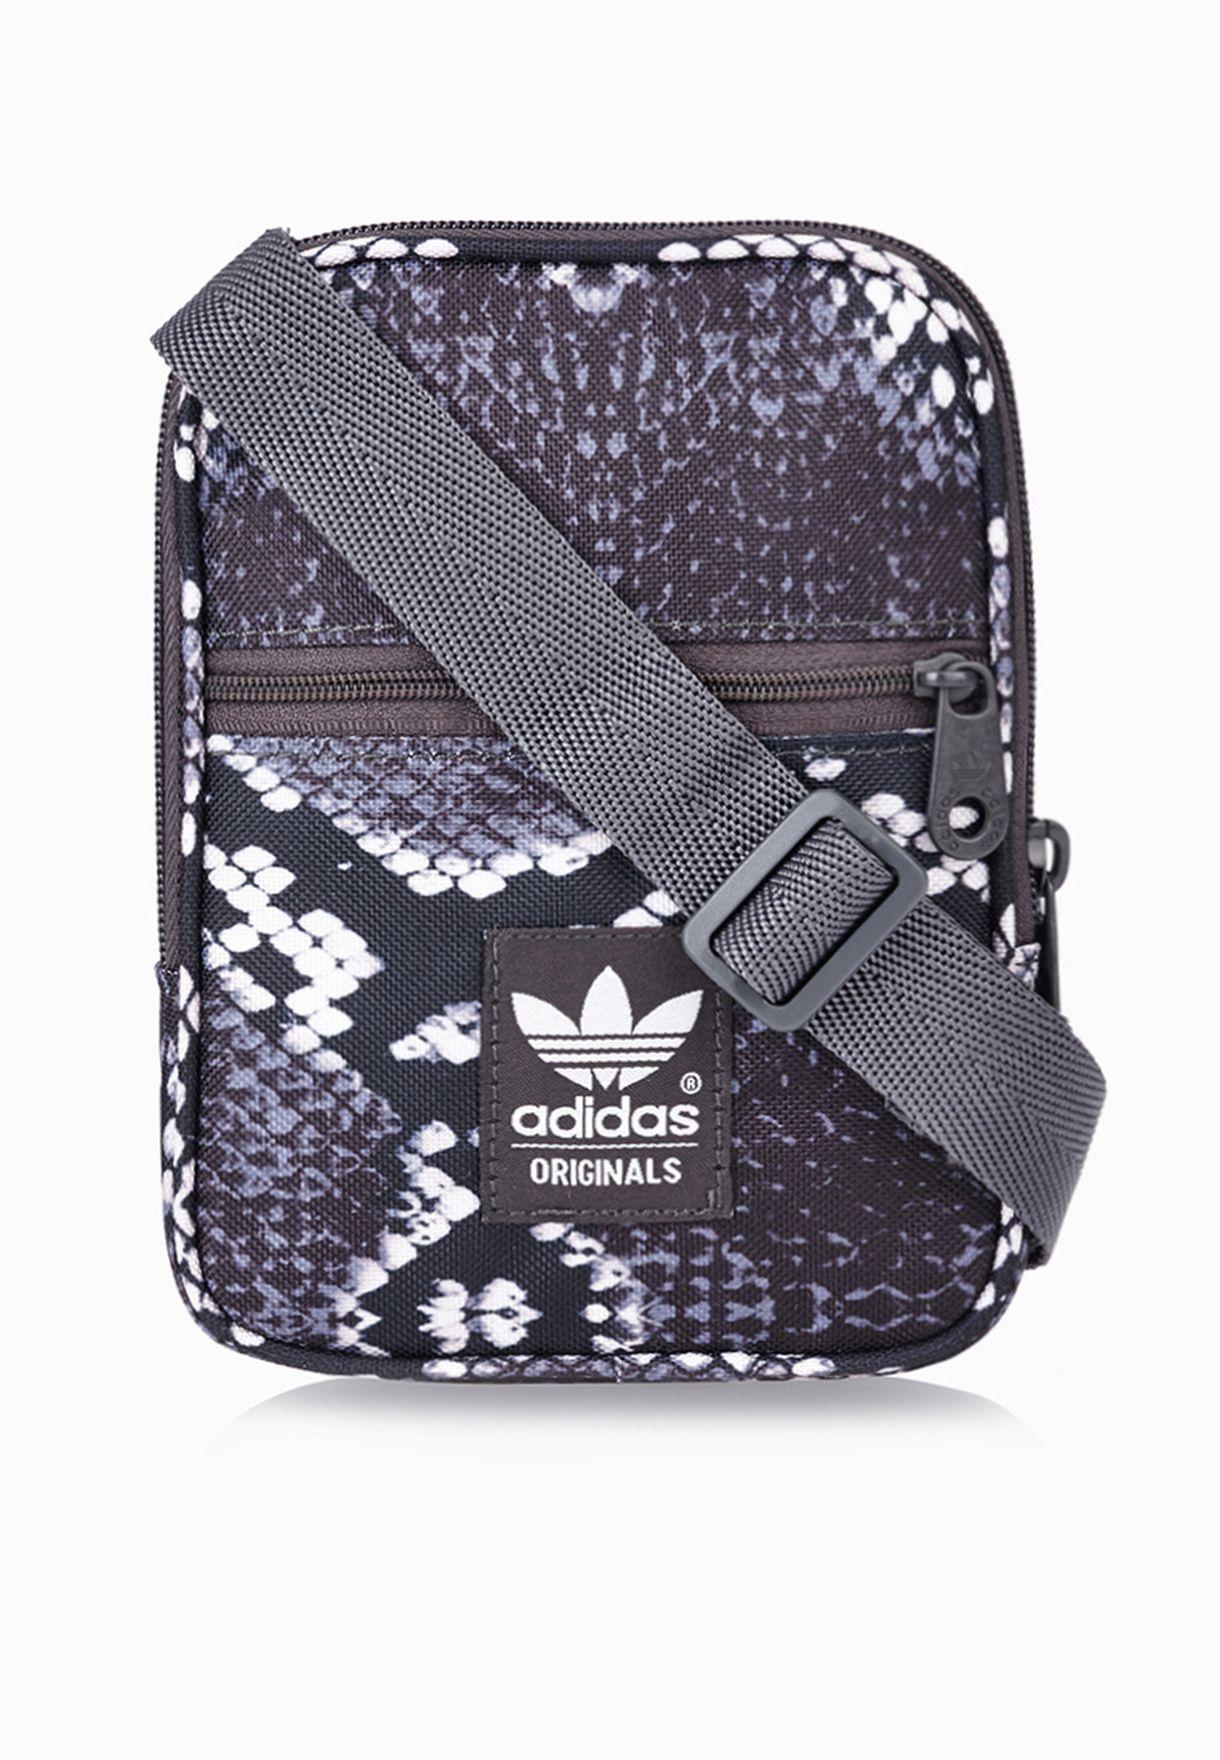 Shop adidas Originals grey Festival Bag AB2737 for Men in Bahrain -  AD478AC38GOJ ce19a30b6ee31